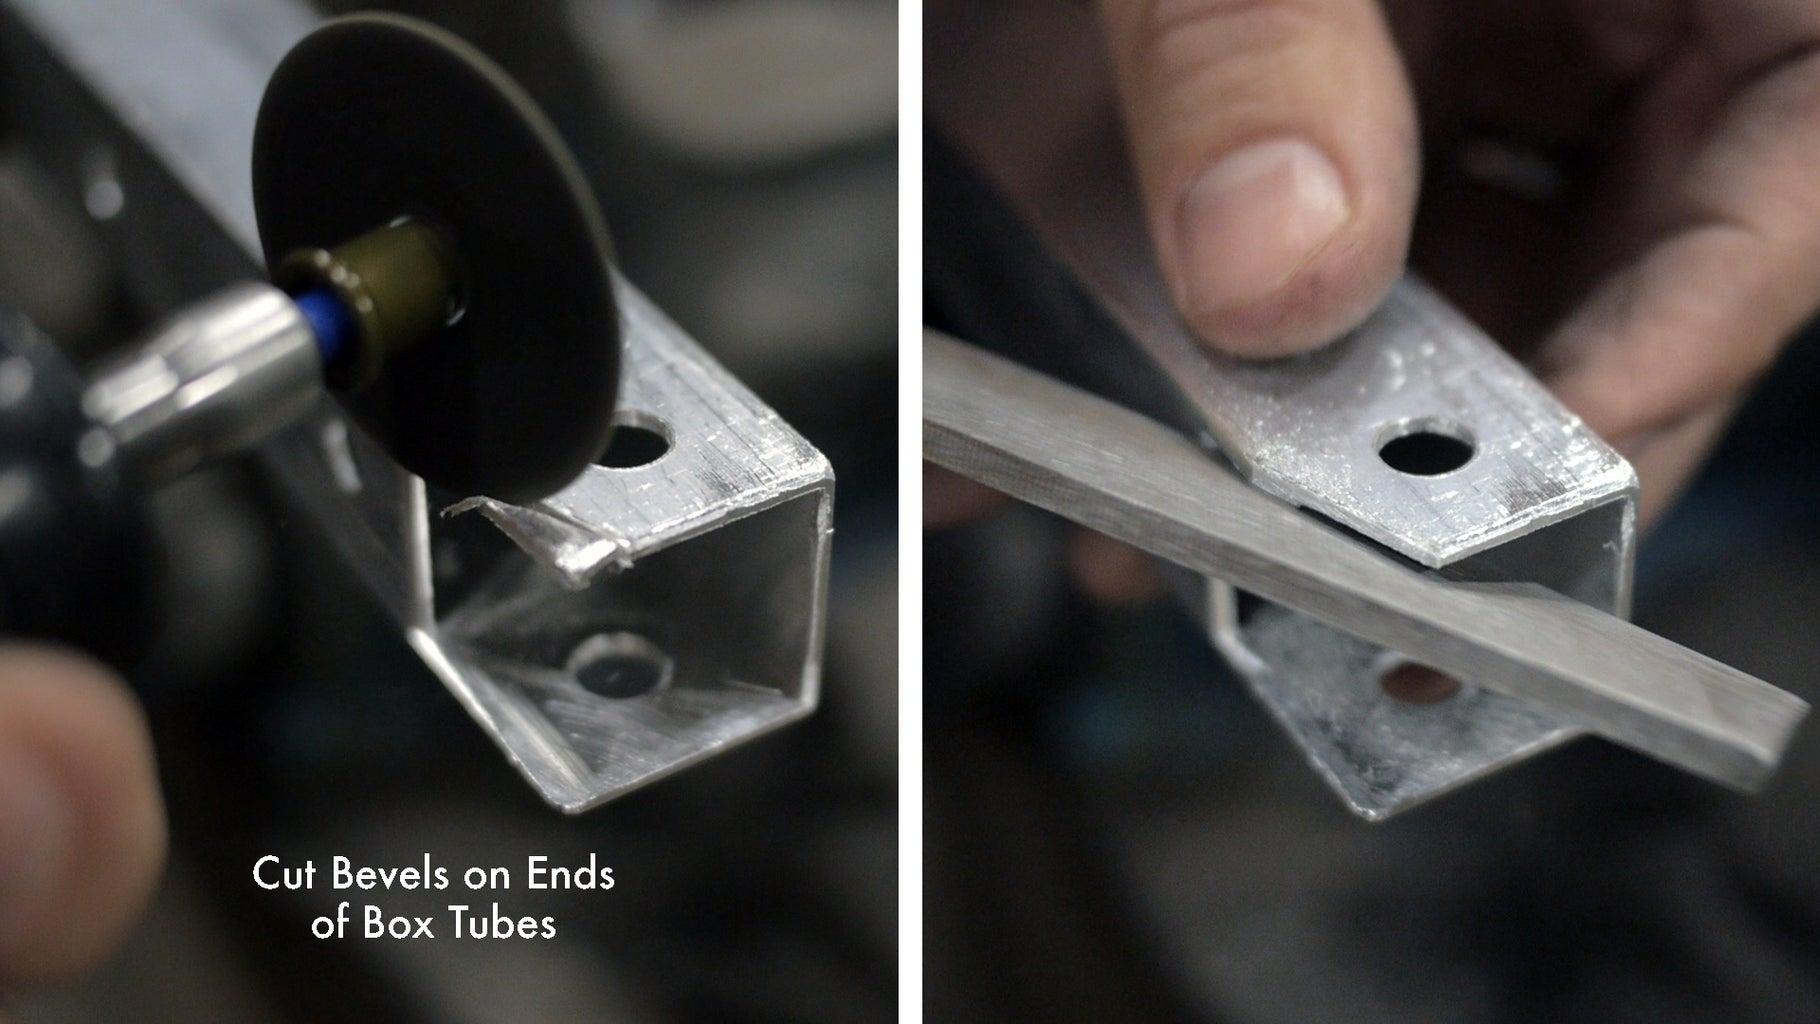 The Perpendicular Box Tubes